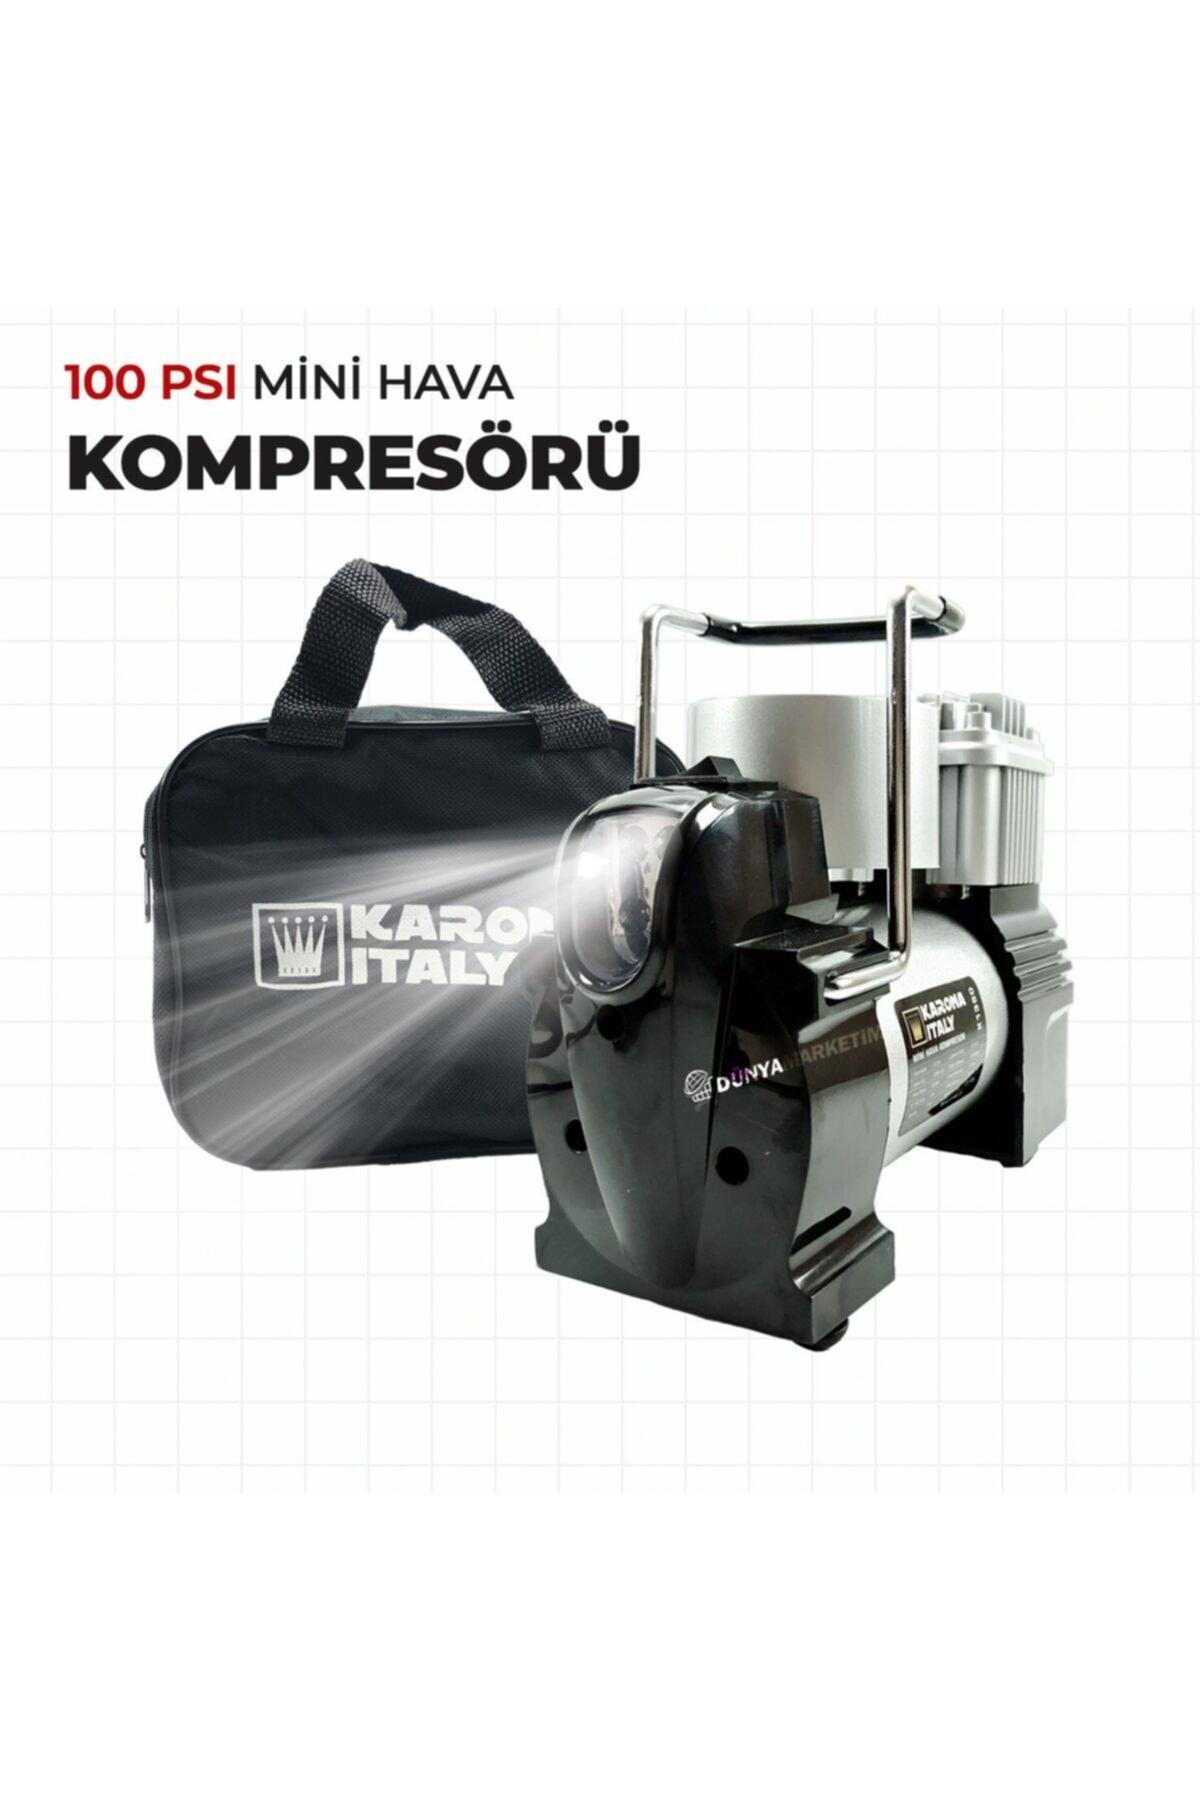 Karona İtaly 100 Psı Mini Hava Kompresörü Araç Kompresörü 2